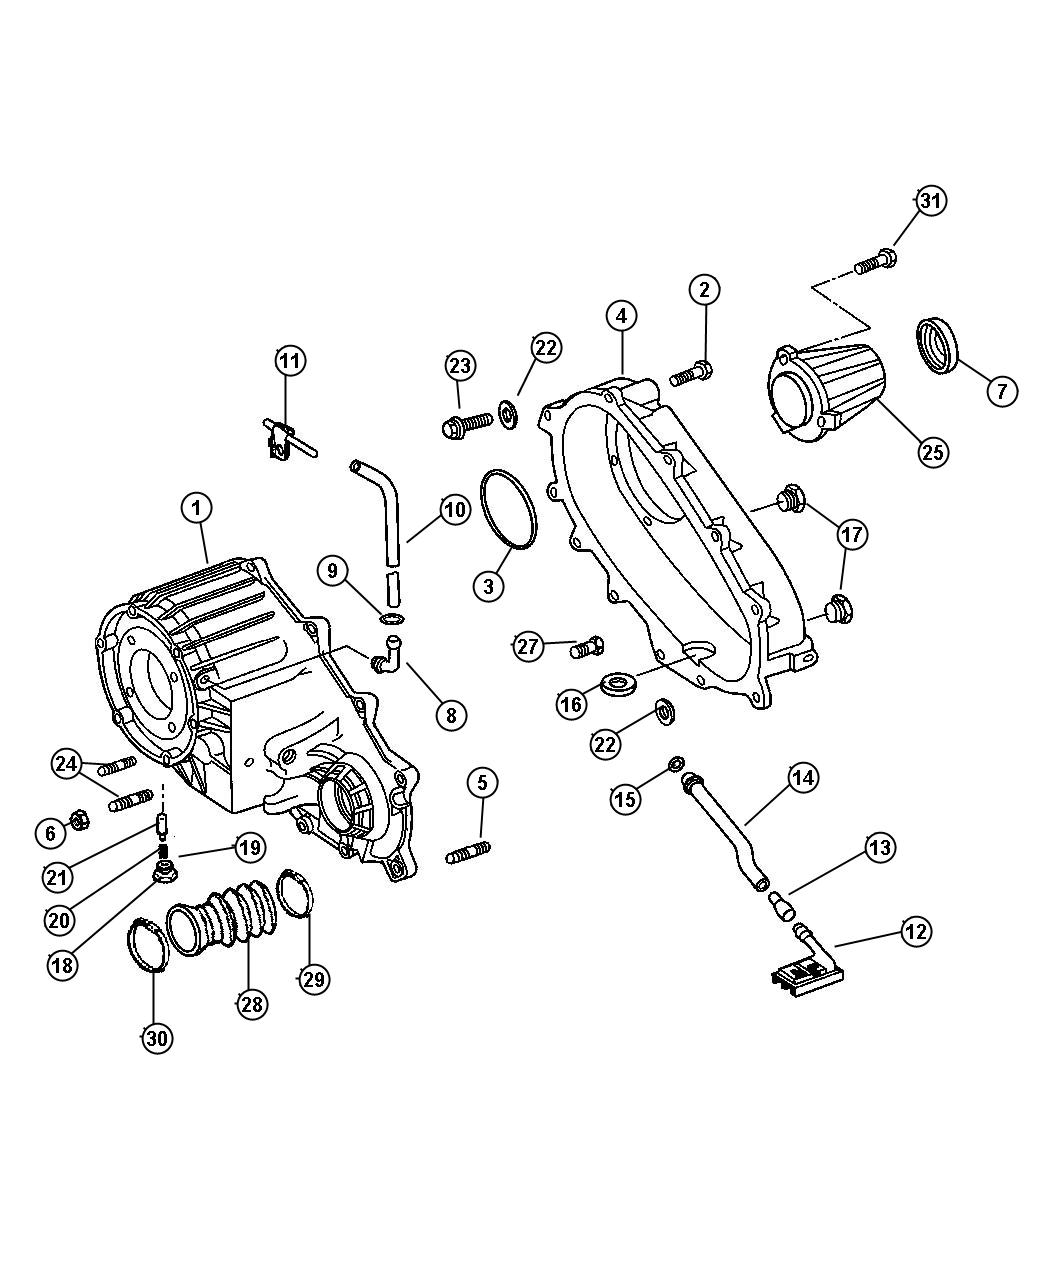 2011 Dodge Truck Manual Transmission download free